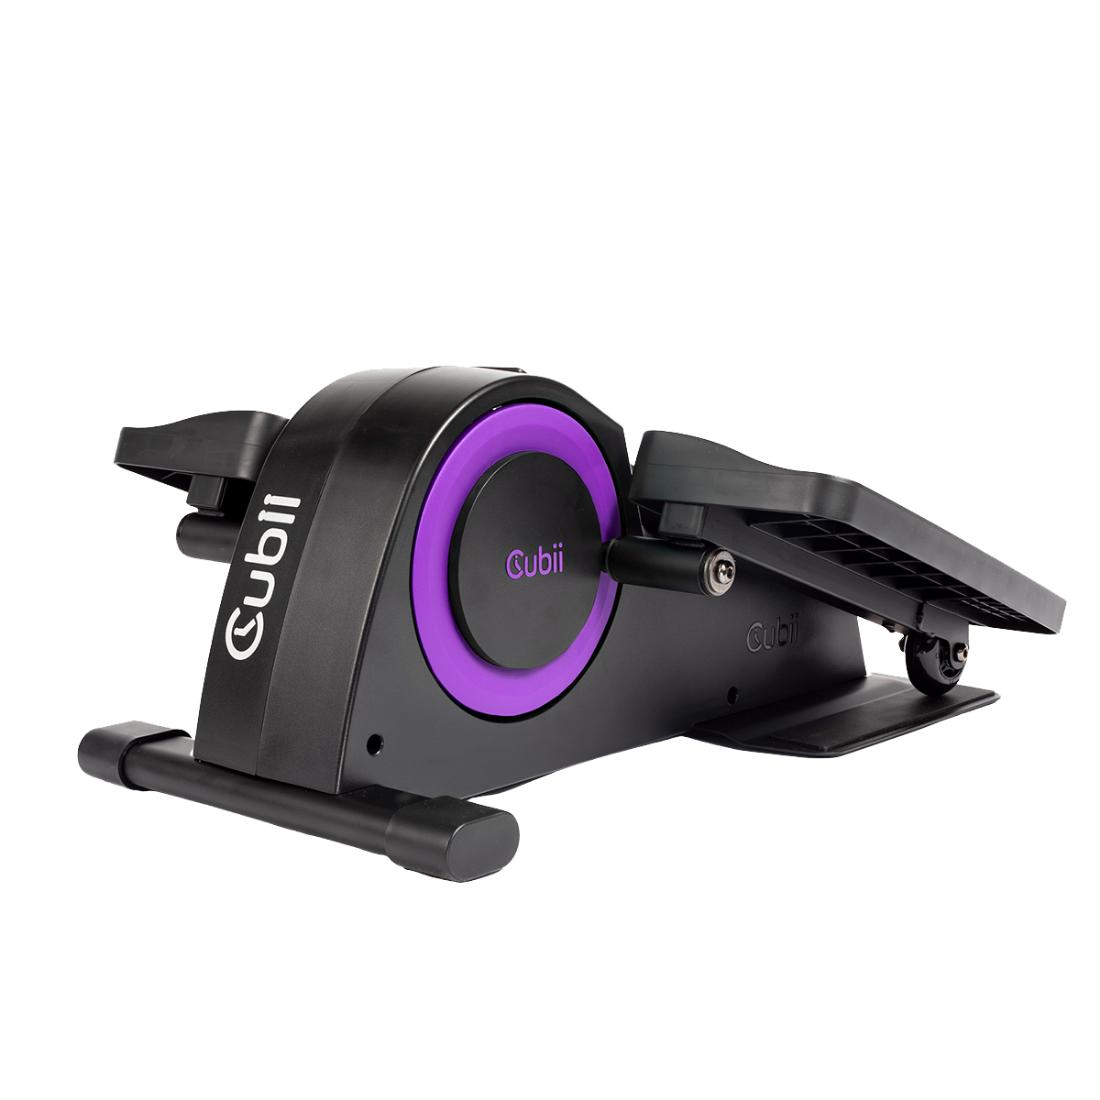 An image of Cubii - Purple